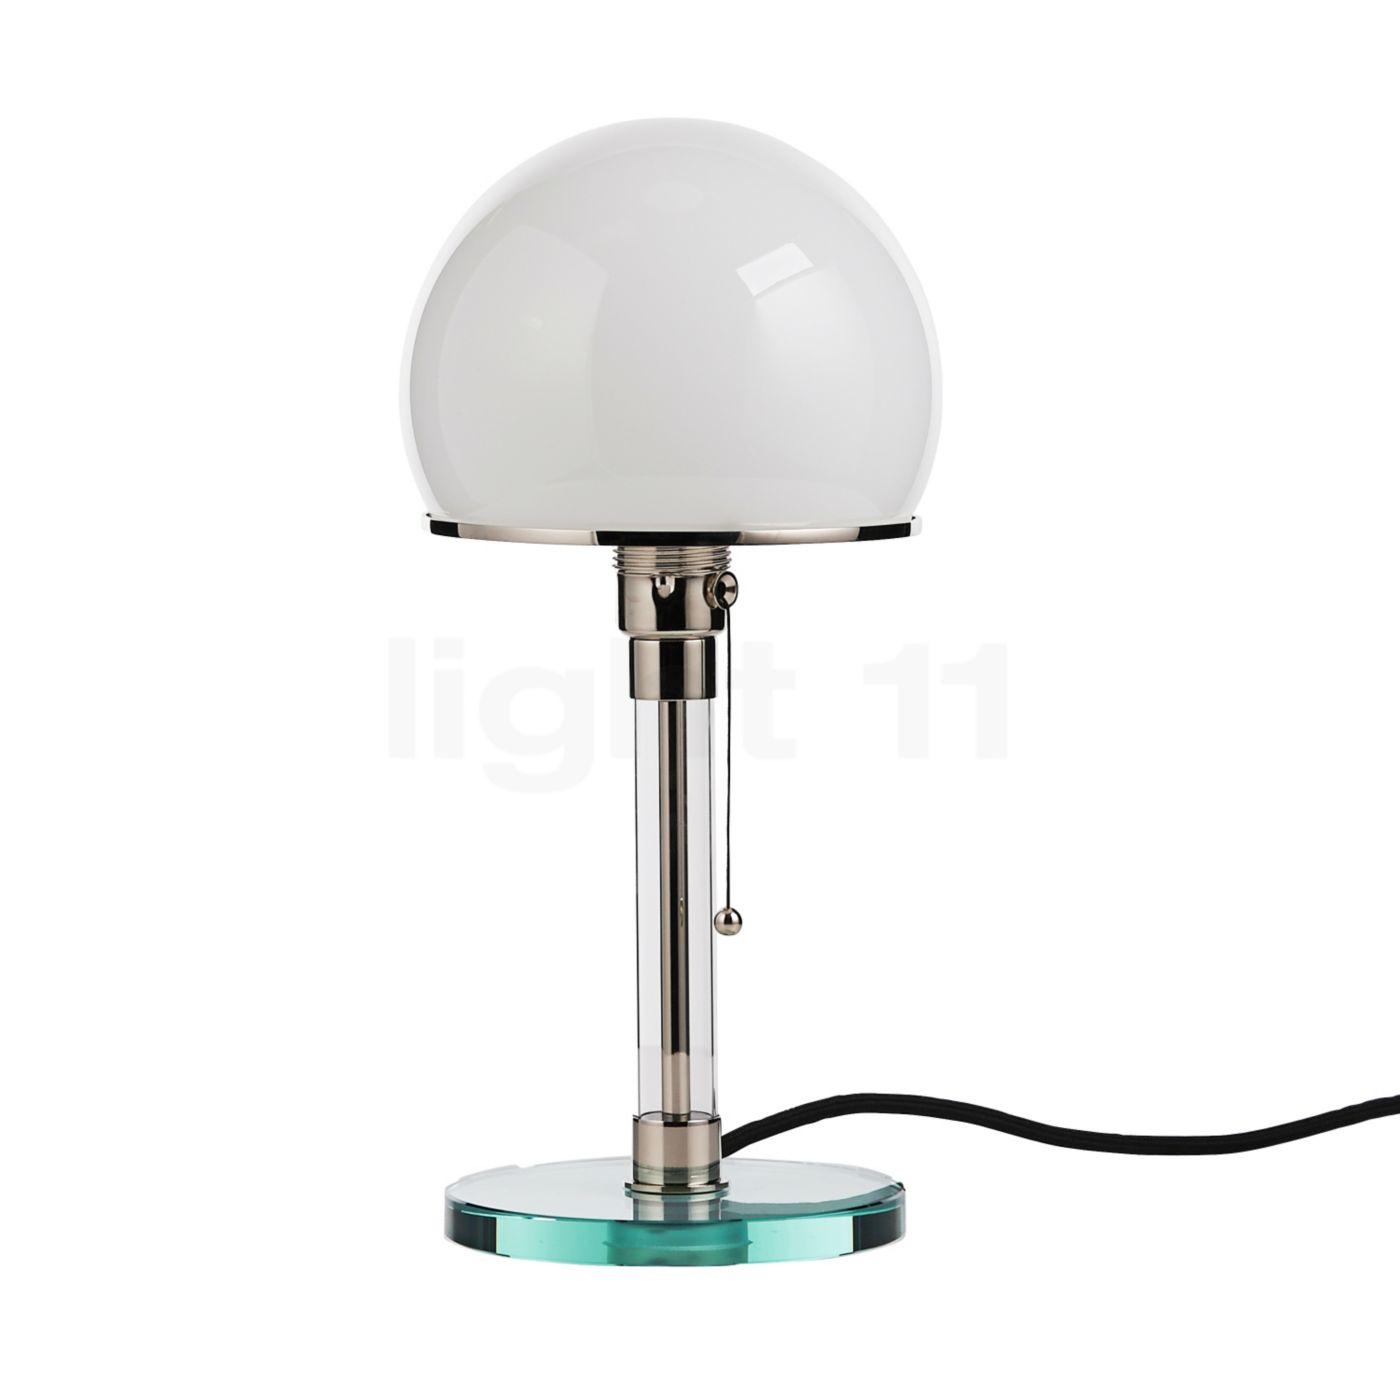 Tecnolumen wagenfeld wg 24 table lamp at light11 aloadofball Gallery